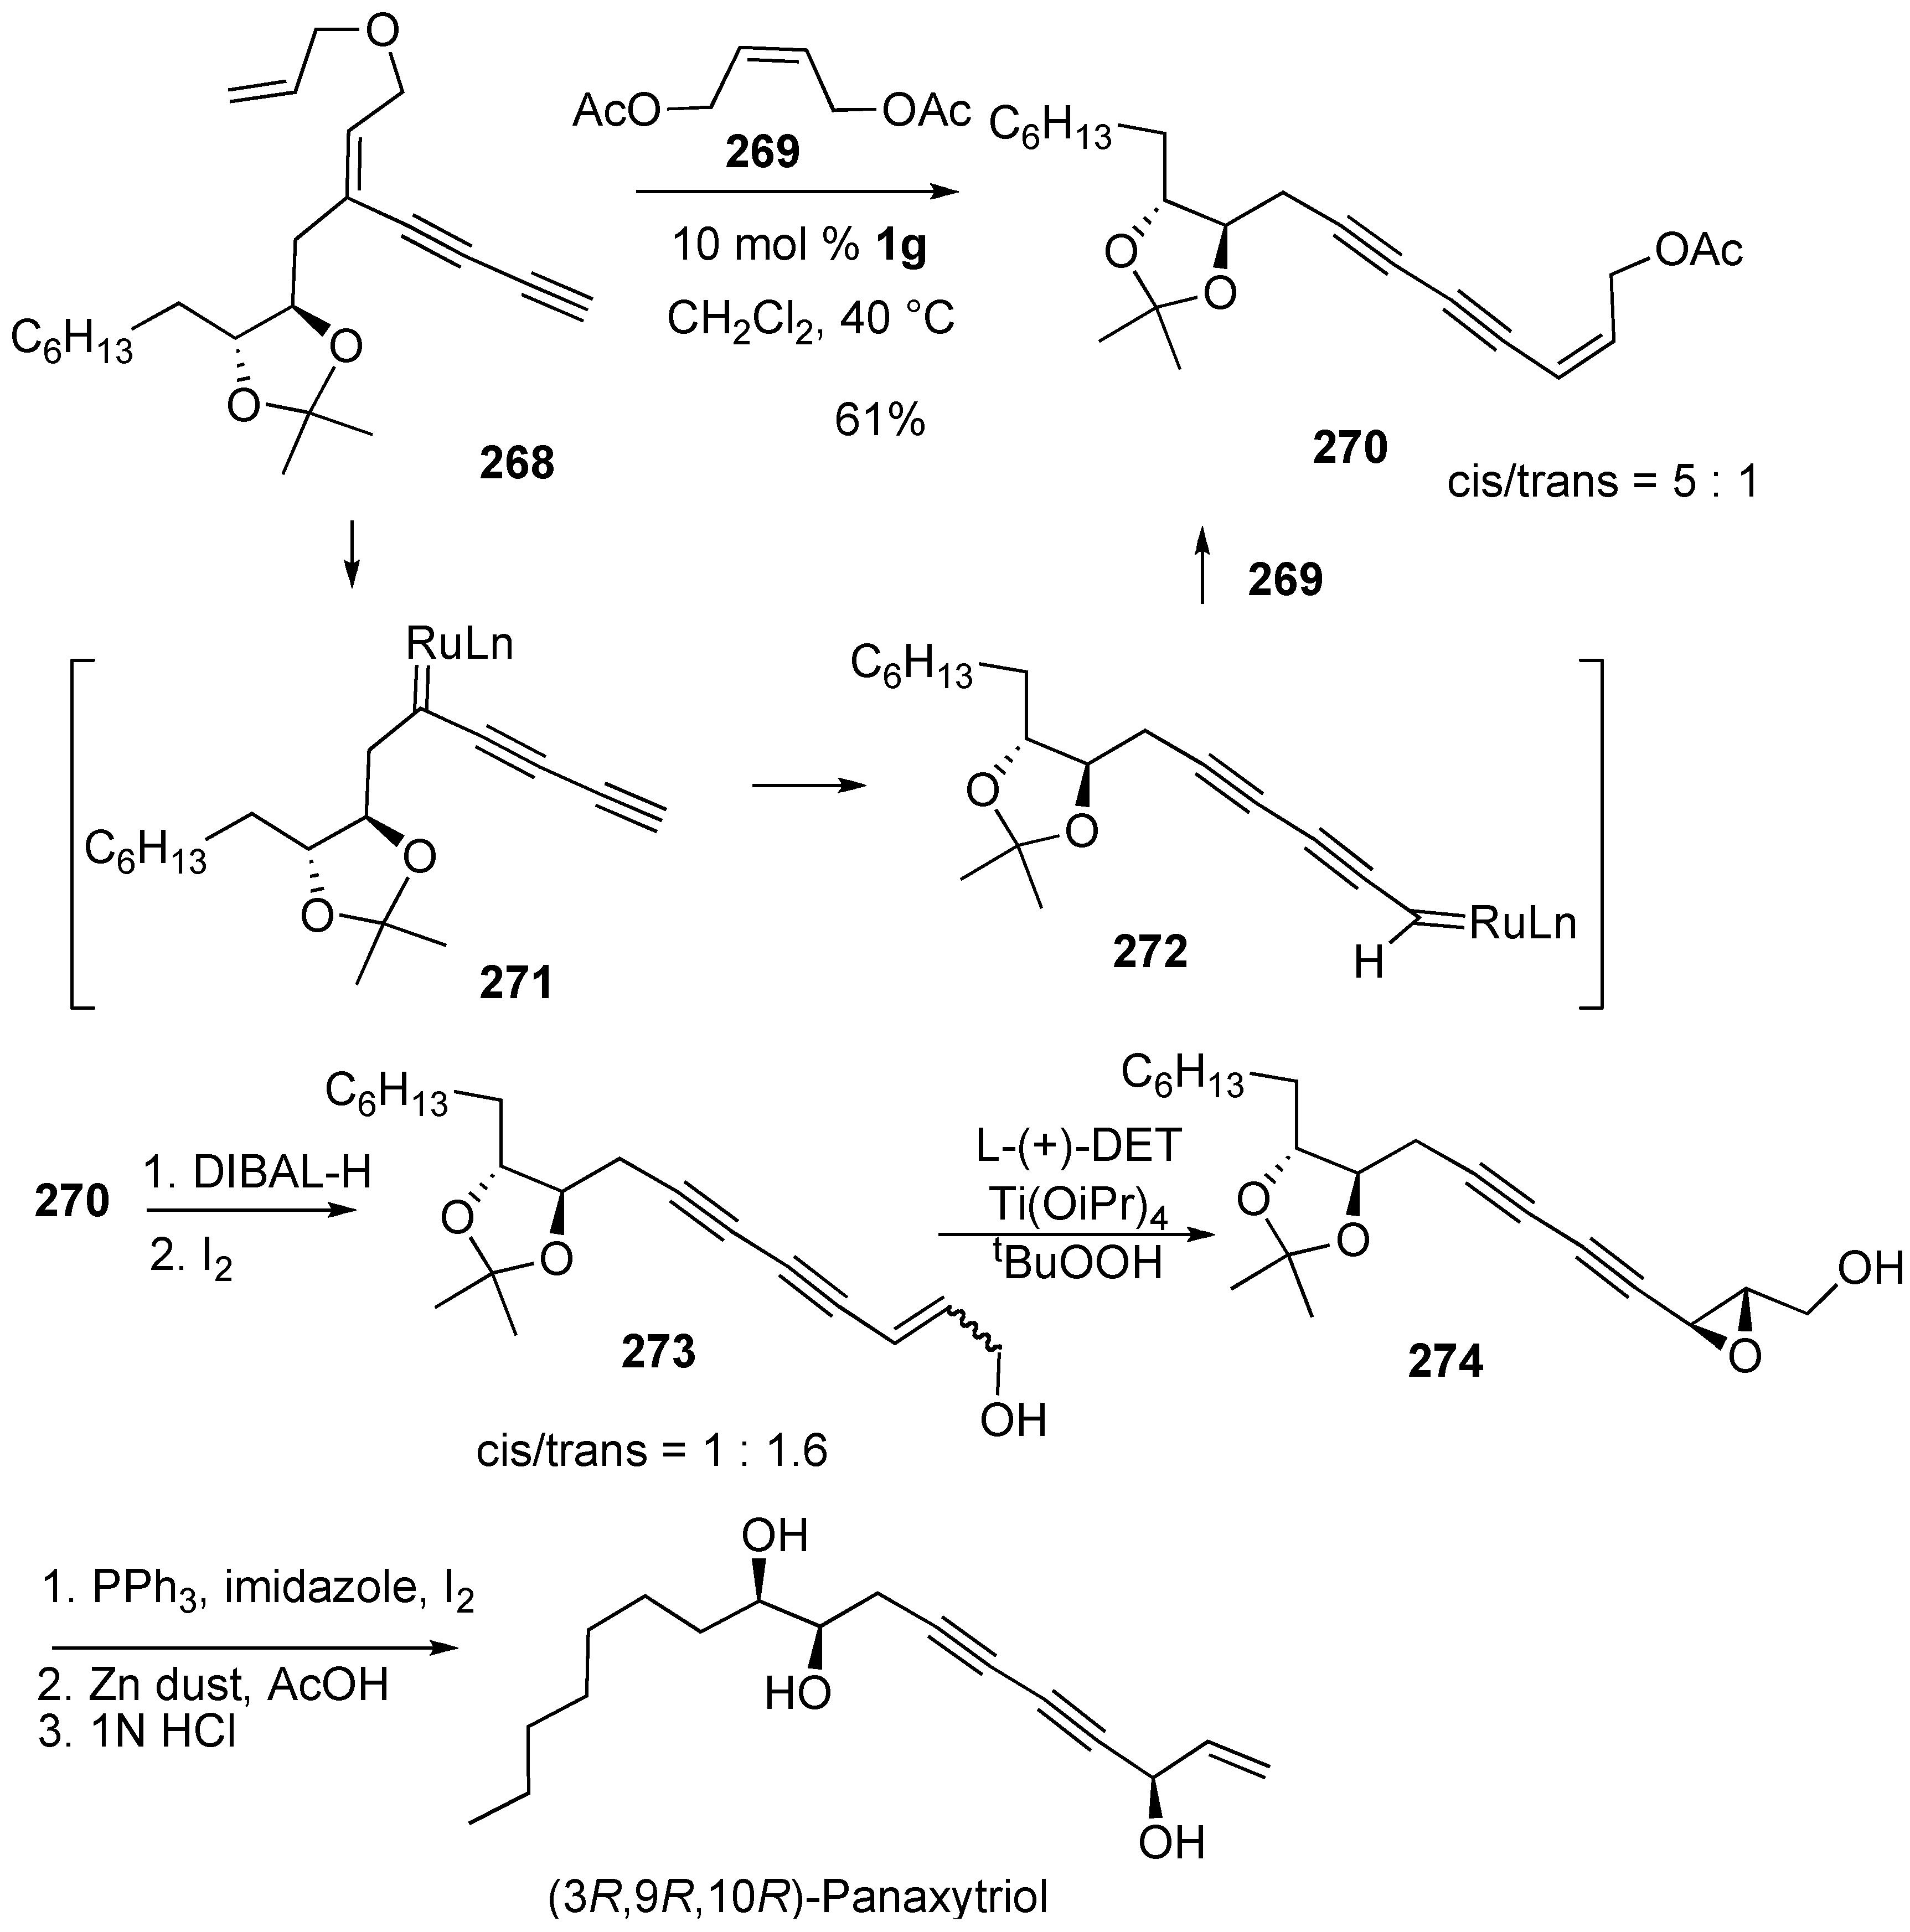 enyne cross-metathesis with ruthenium carbene catalysts